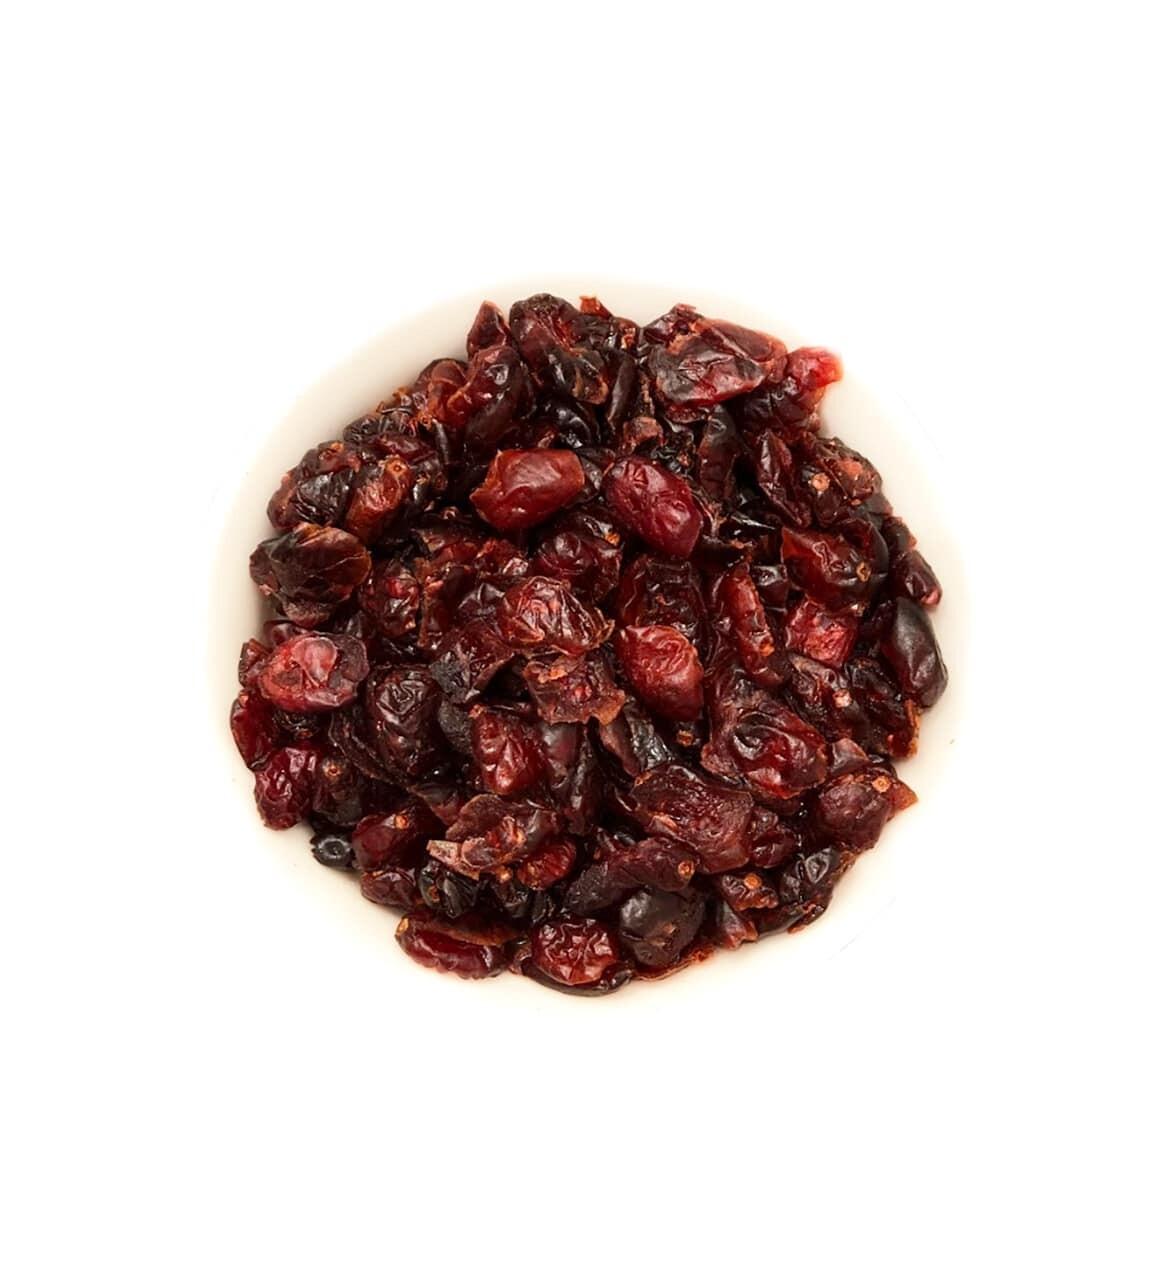 Tong Garden Dried Cranberries 1.0KG